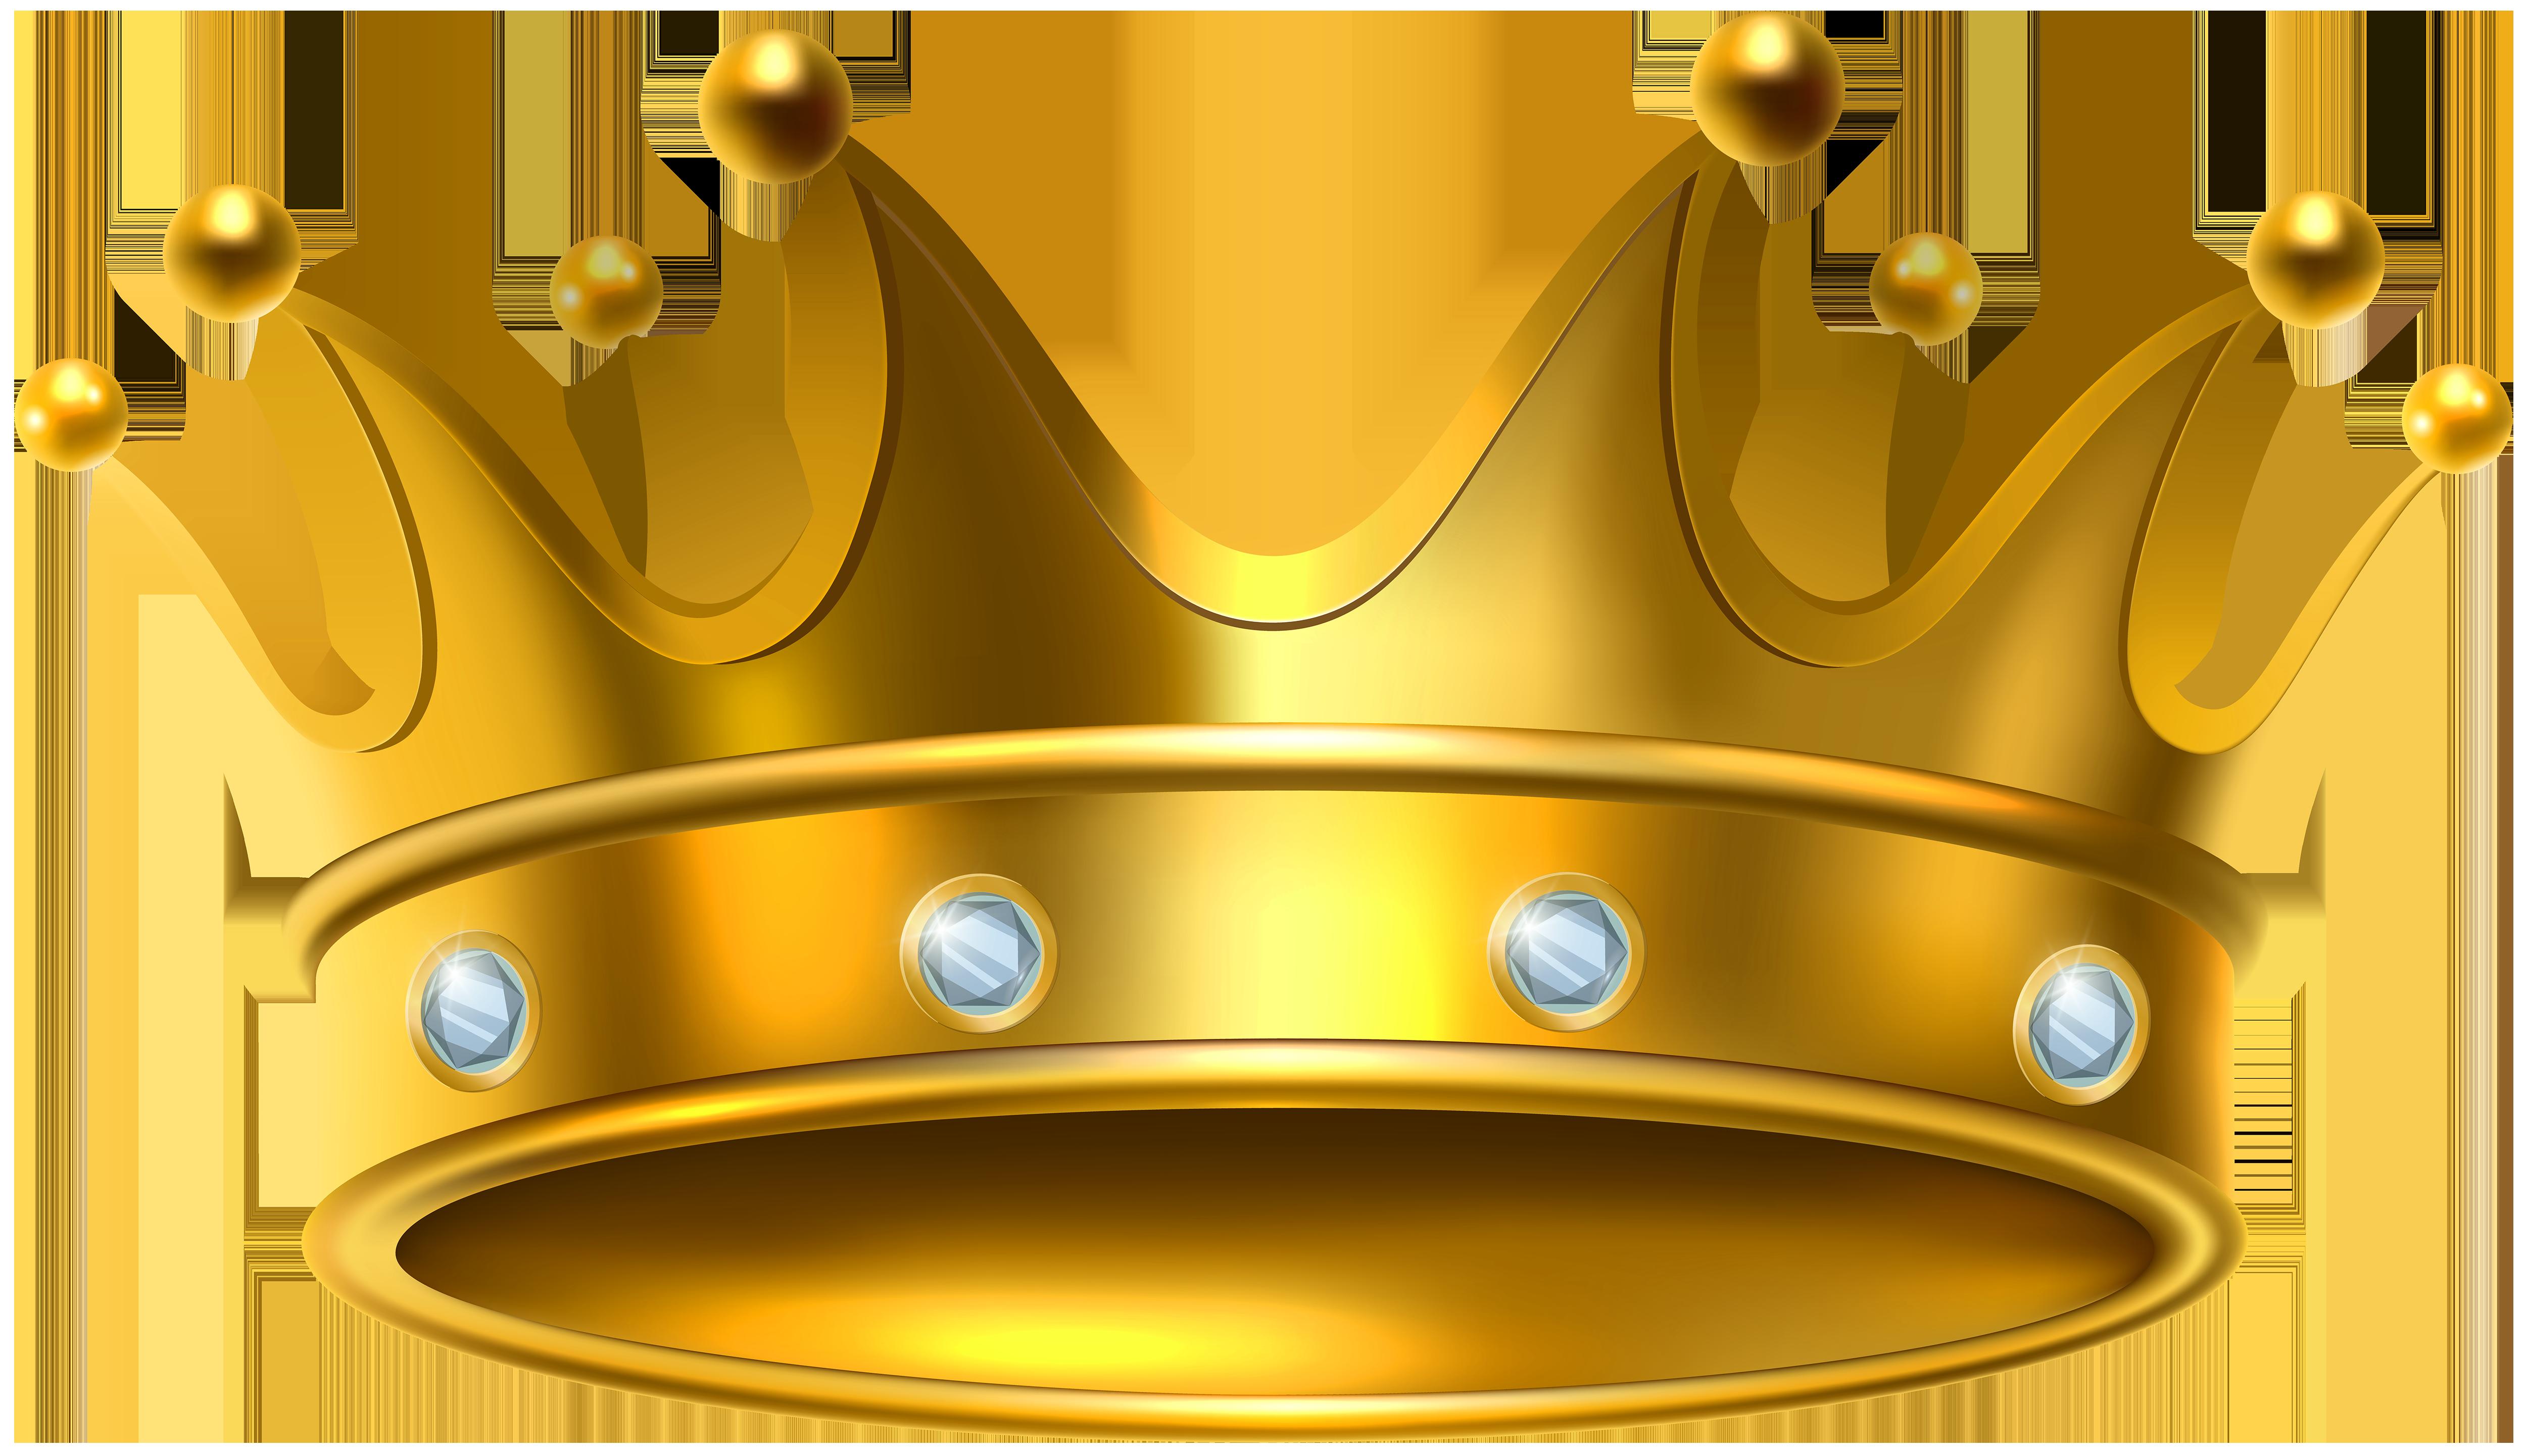 Crown PNG Transparent Image.